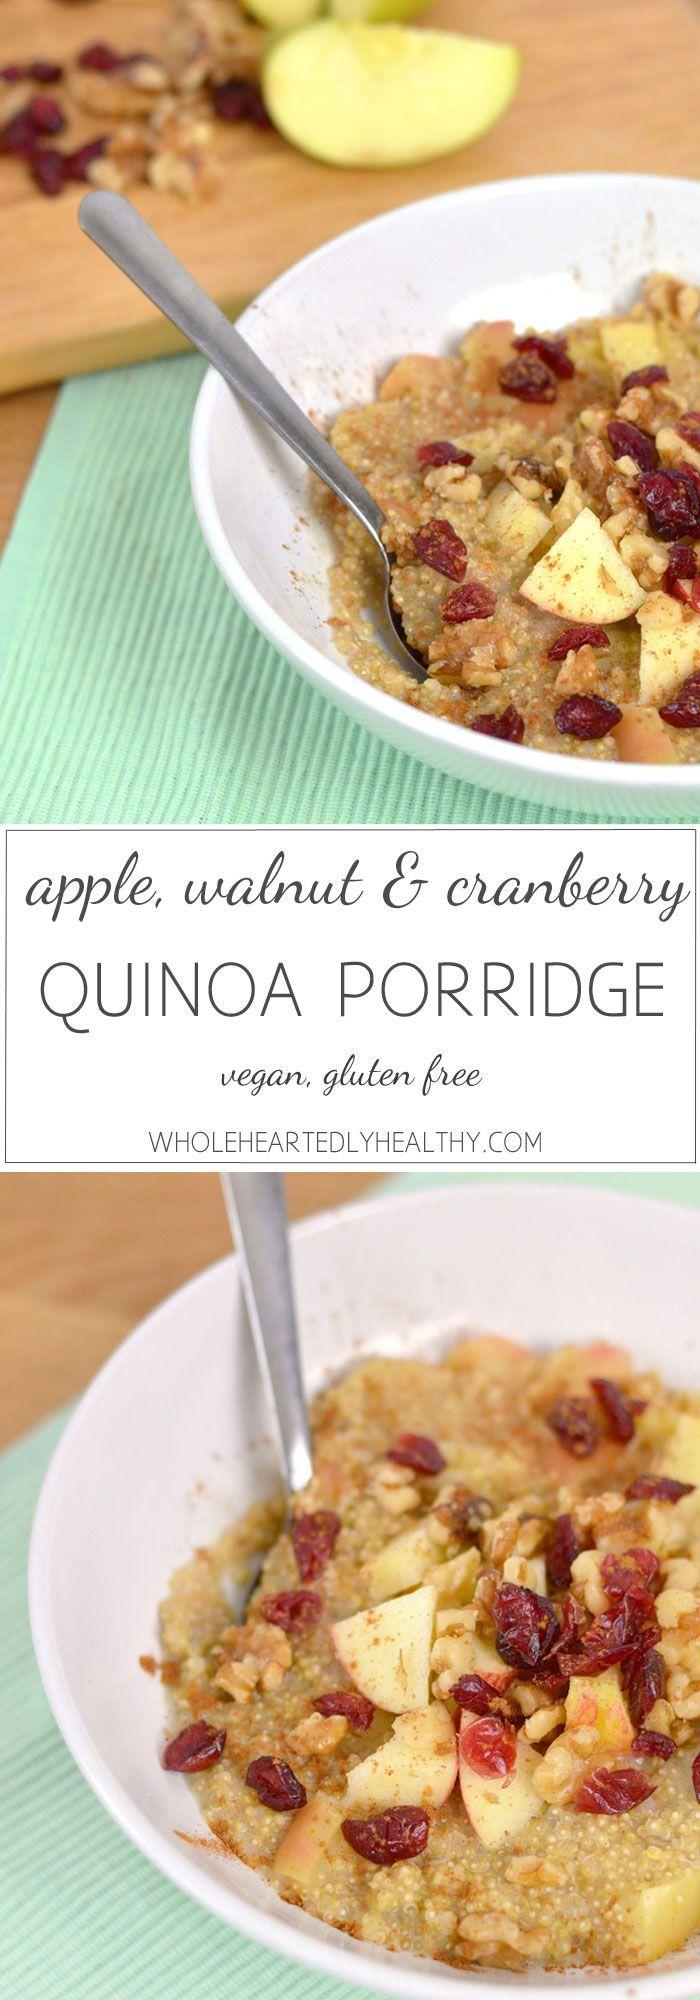 Apple, walnut and cranberry quinoa porridge recipe - Wholeheartedly Healthy